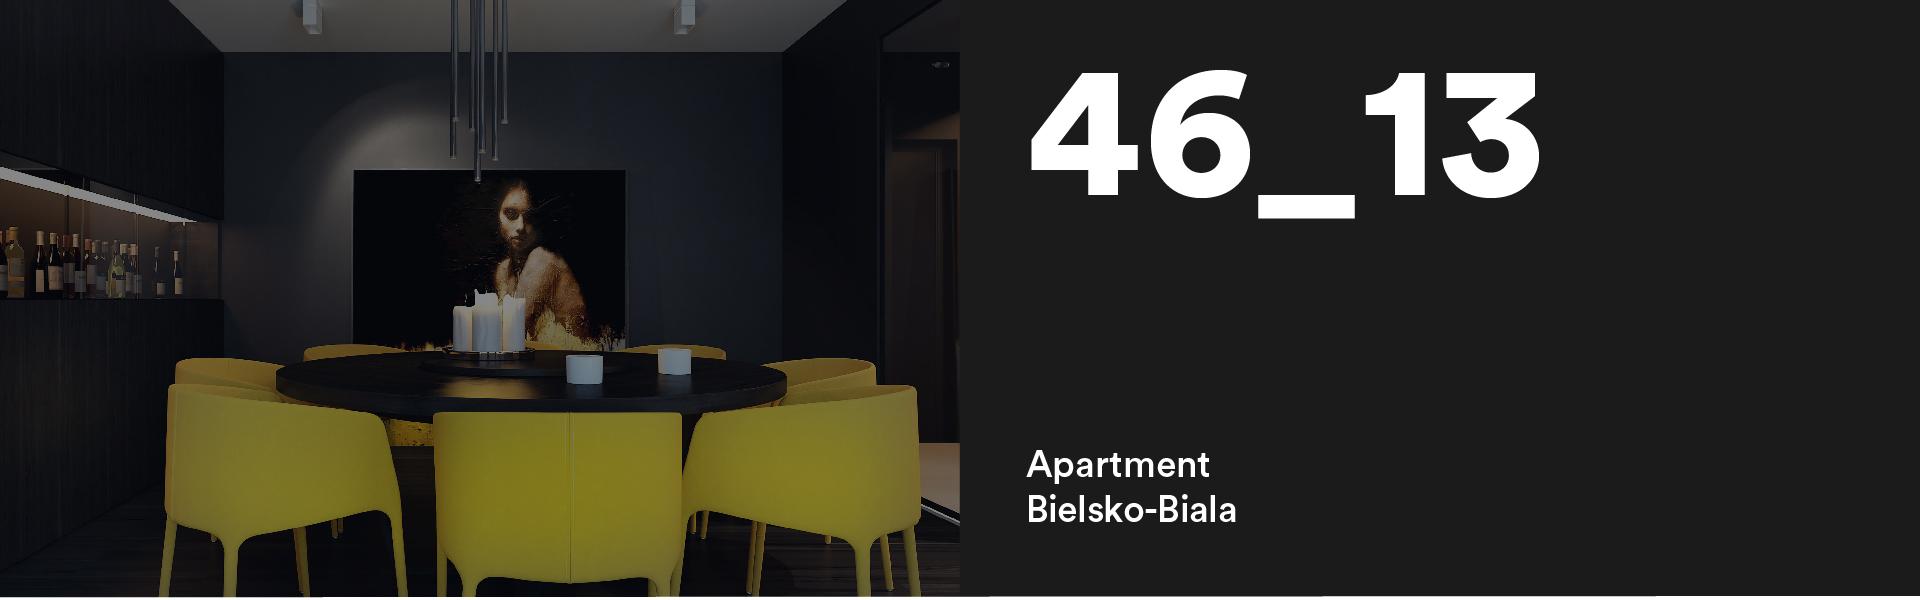 46_13 Apartment Bielsko-Biala